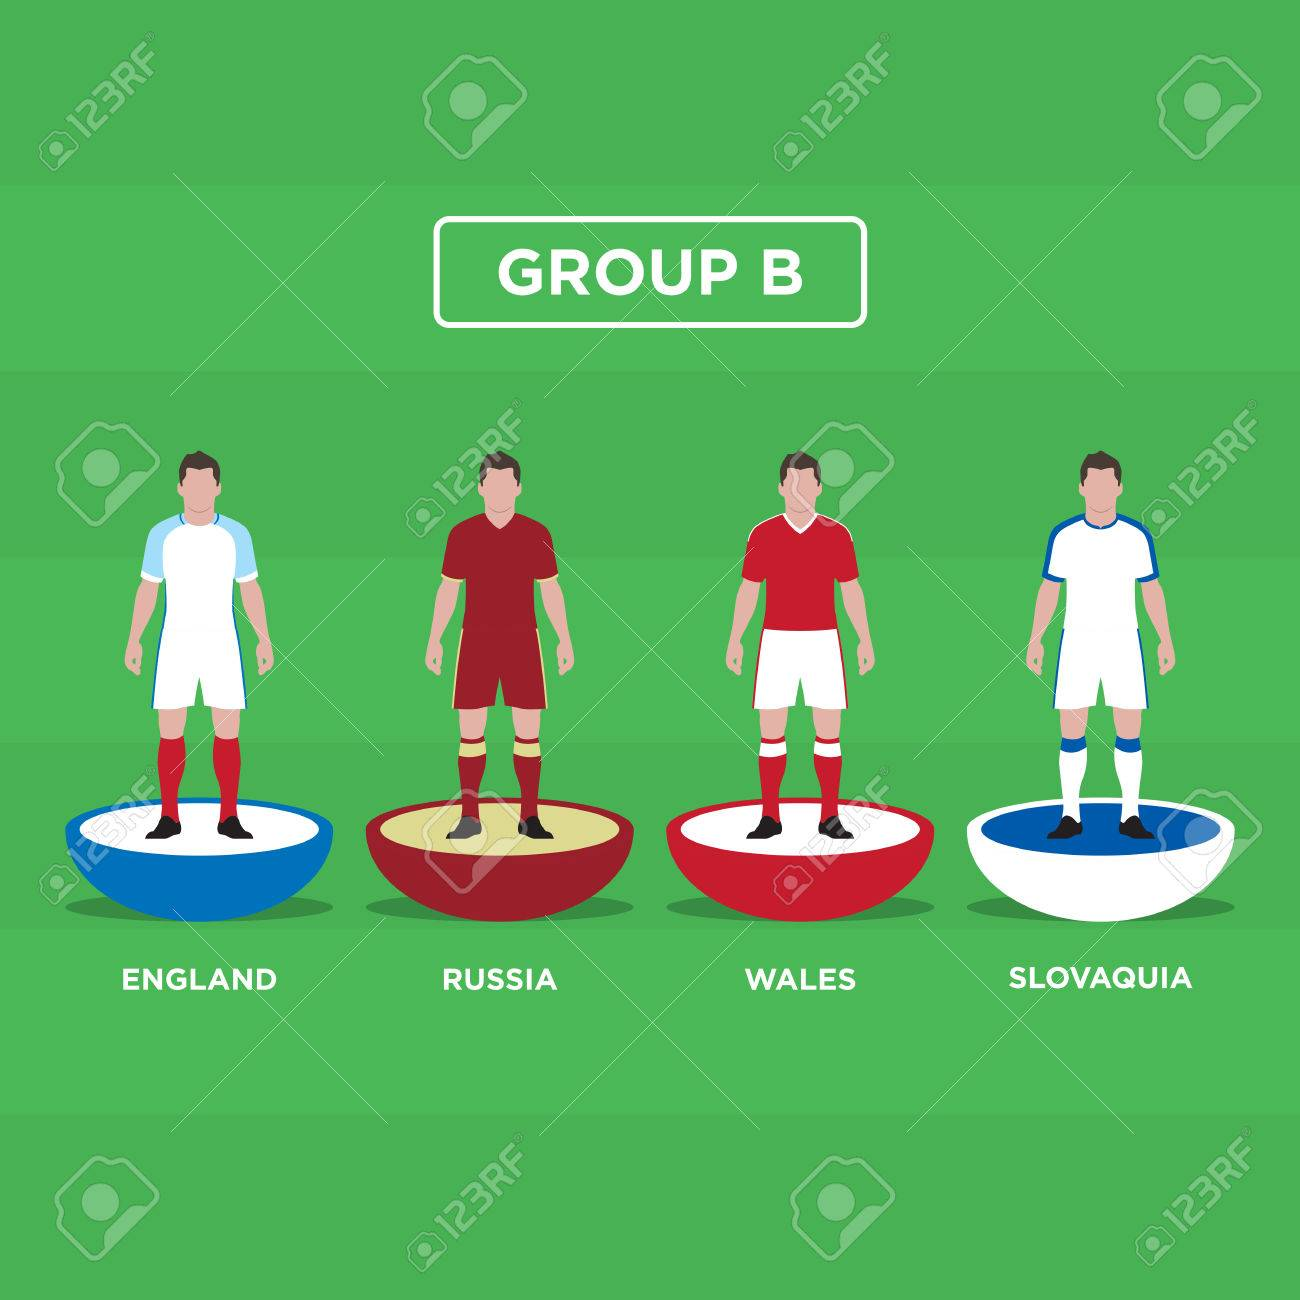 Table Football Football Joueurs France Euro 2016 Groupe B